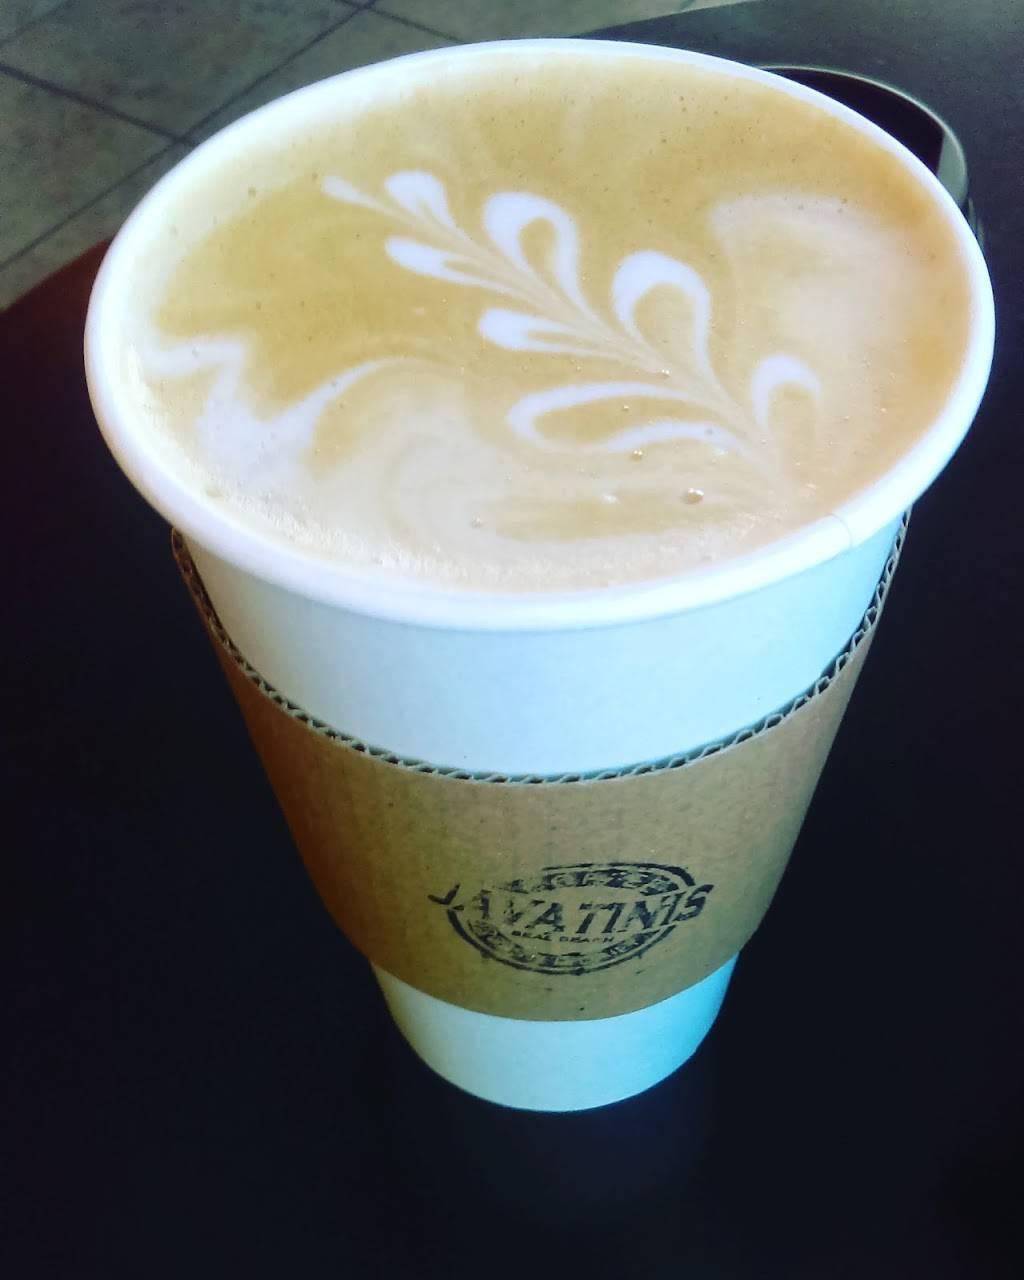 Javatinis Espresso & Gelato - cafe  | Photo 3 of 9 | Address: 148 Main St, Seal Beach, CA 90740, USA | Phone: (562) 626-8202